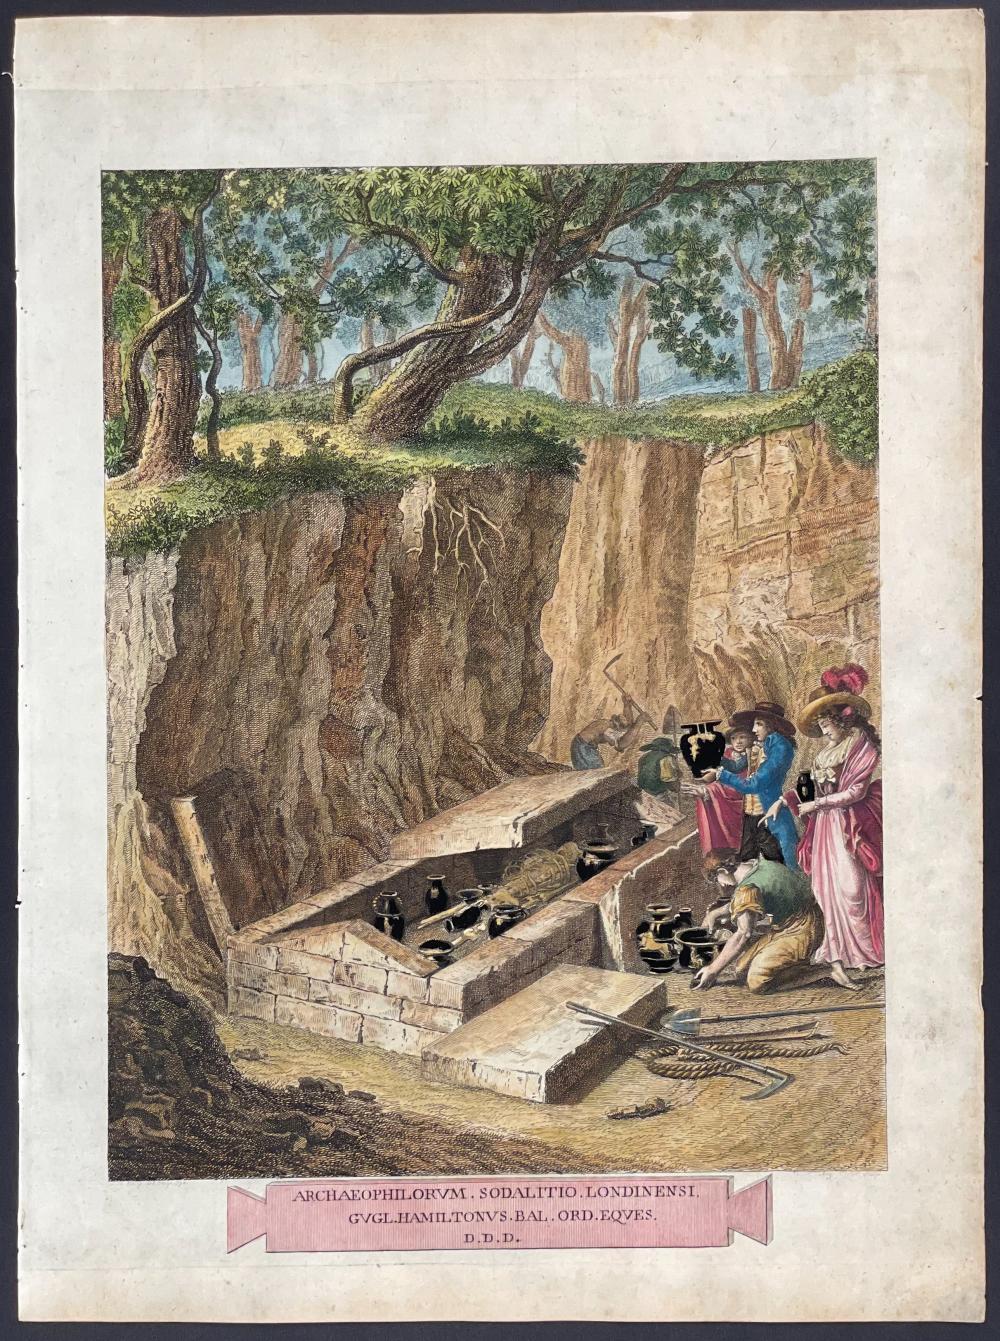 Hamilton - Discovery of Ancient Pottery